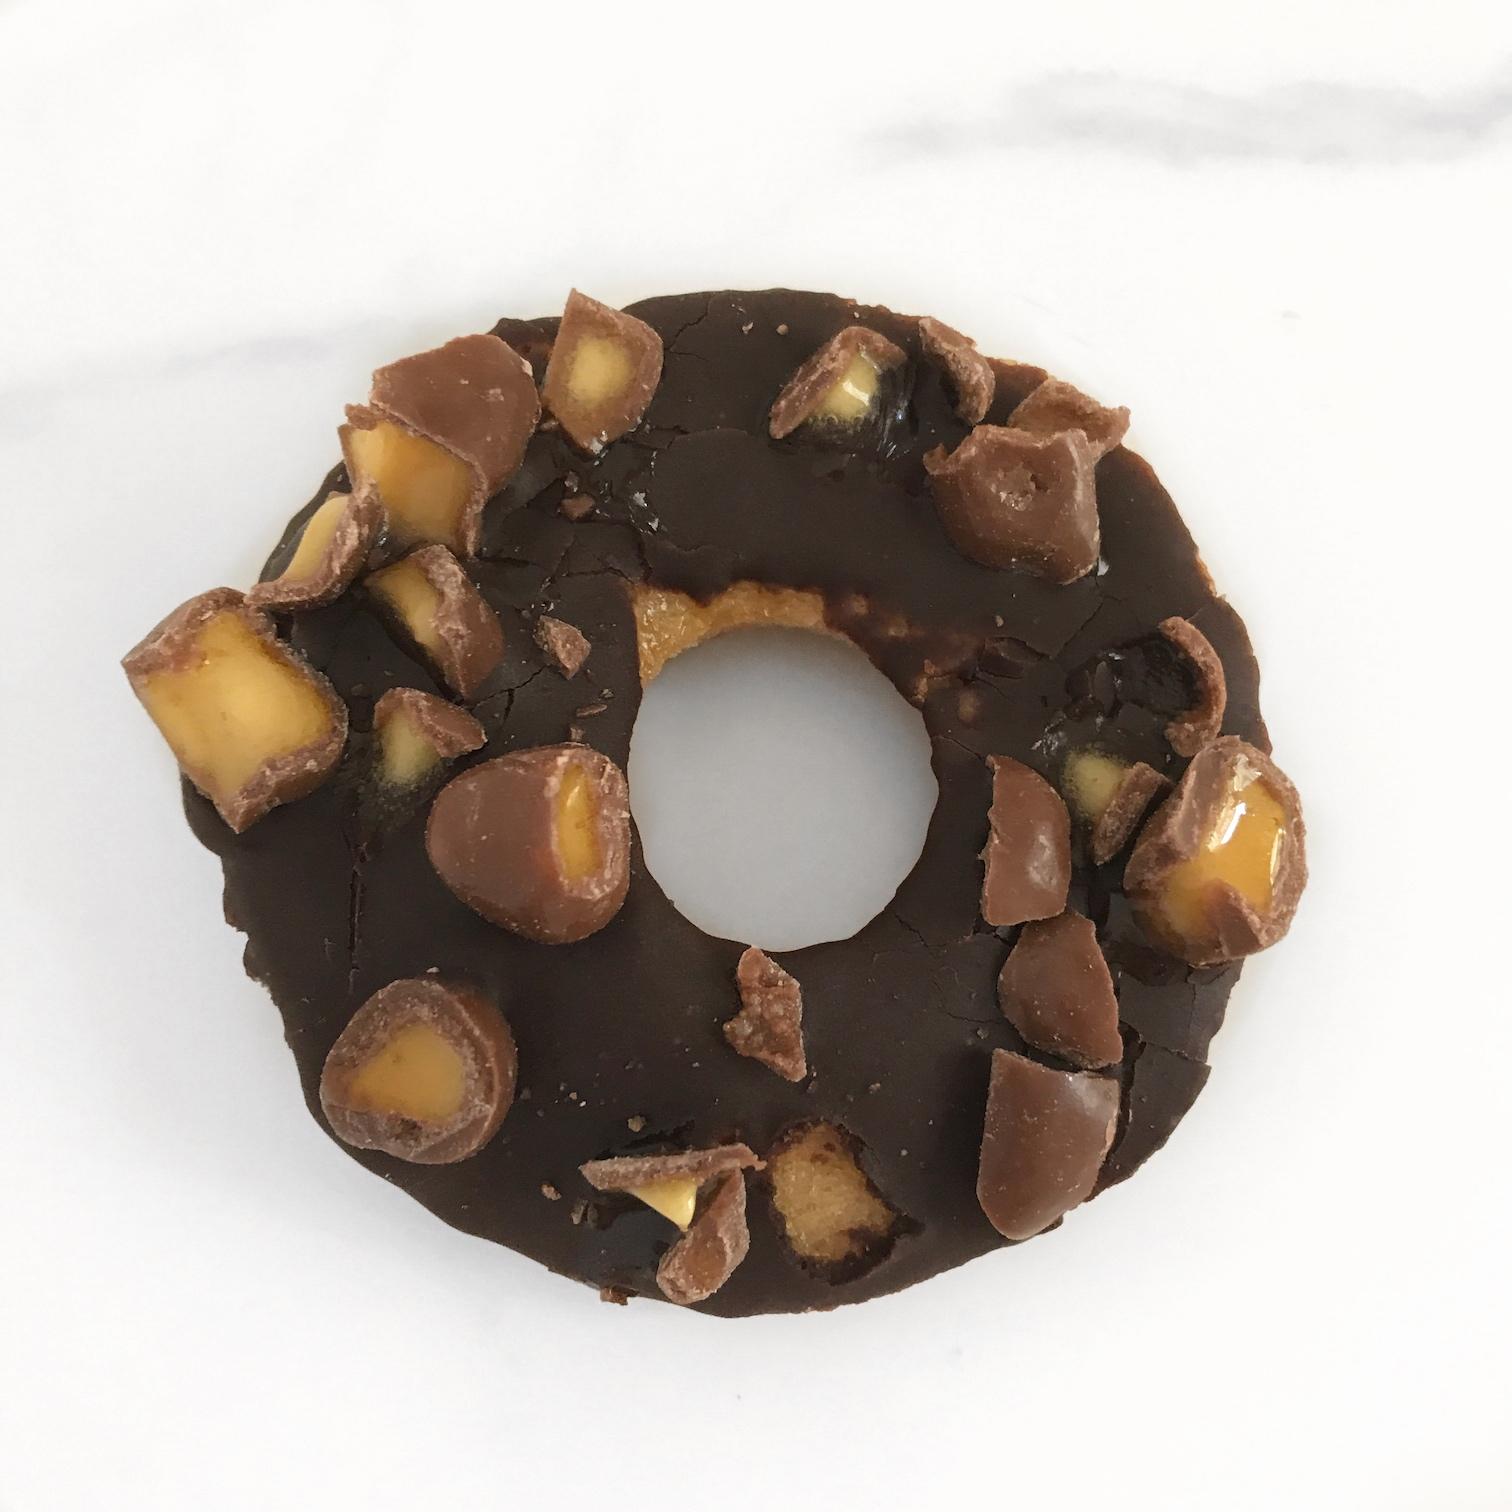 toronto-life-doughnut-festival-2018-dufferin-mall-10tation-catering-3.JPG